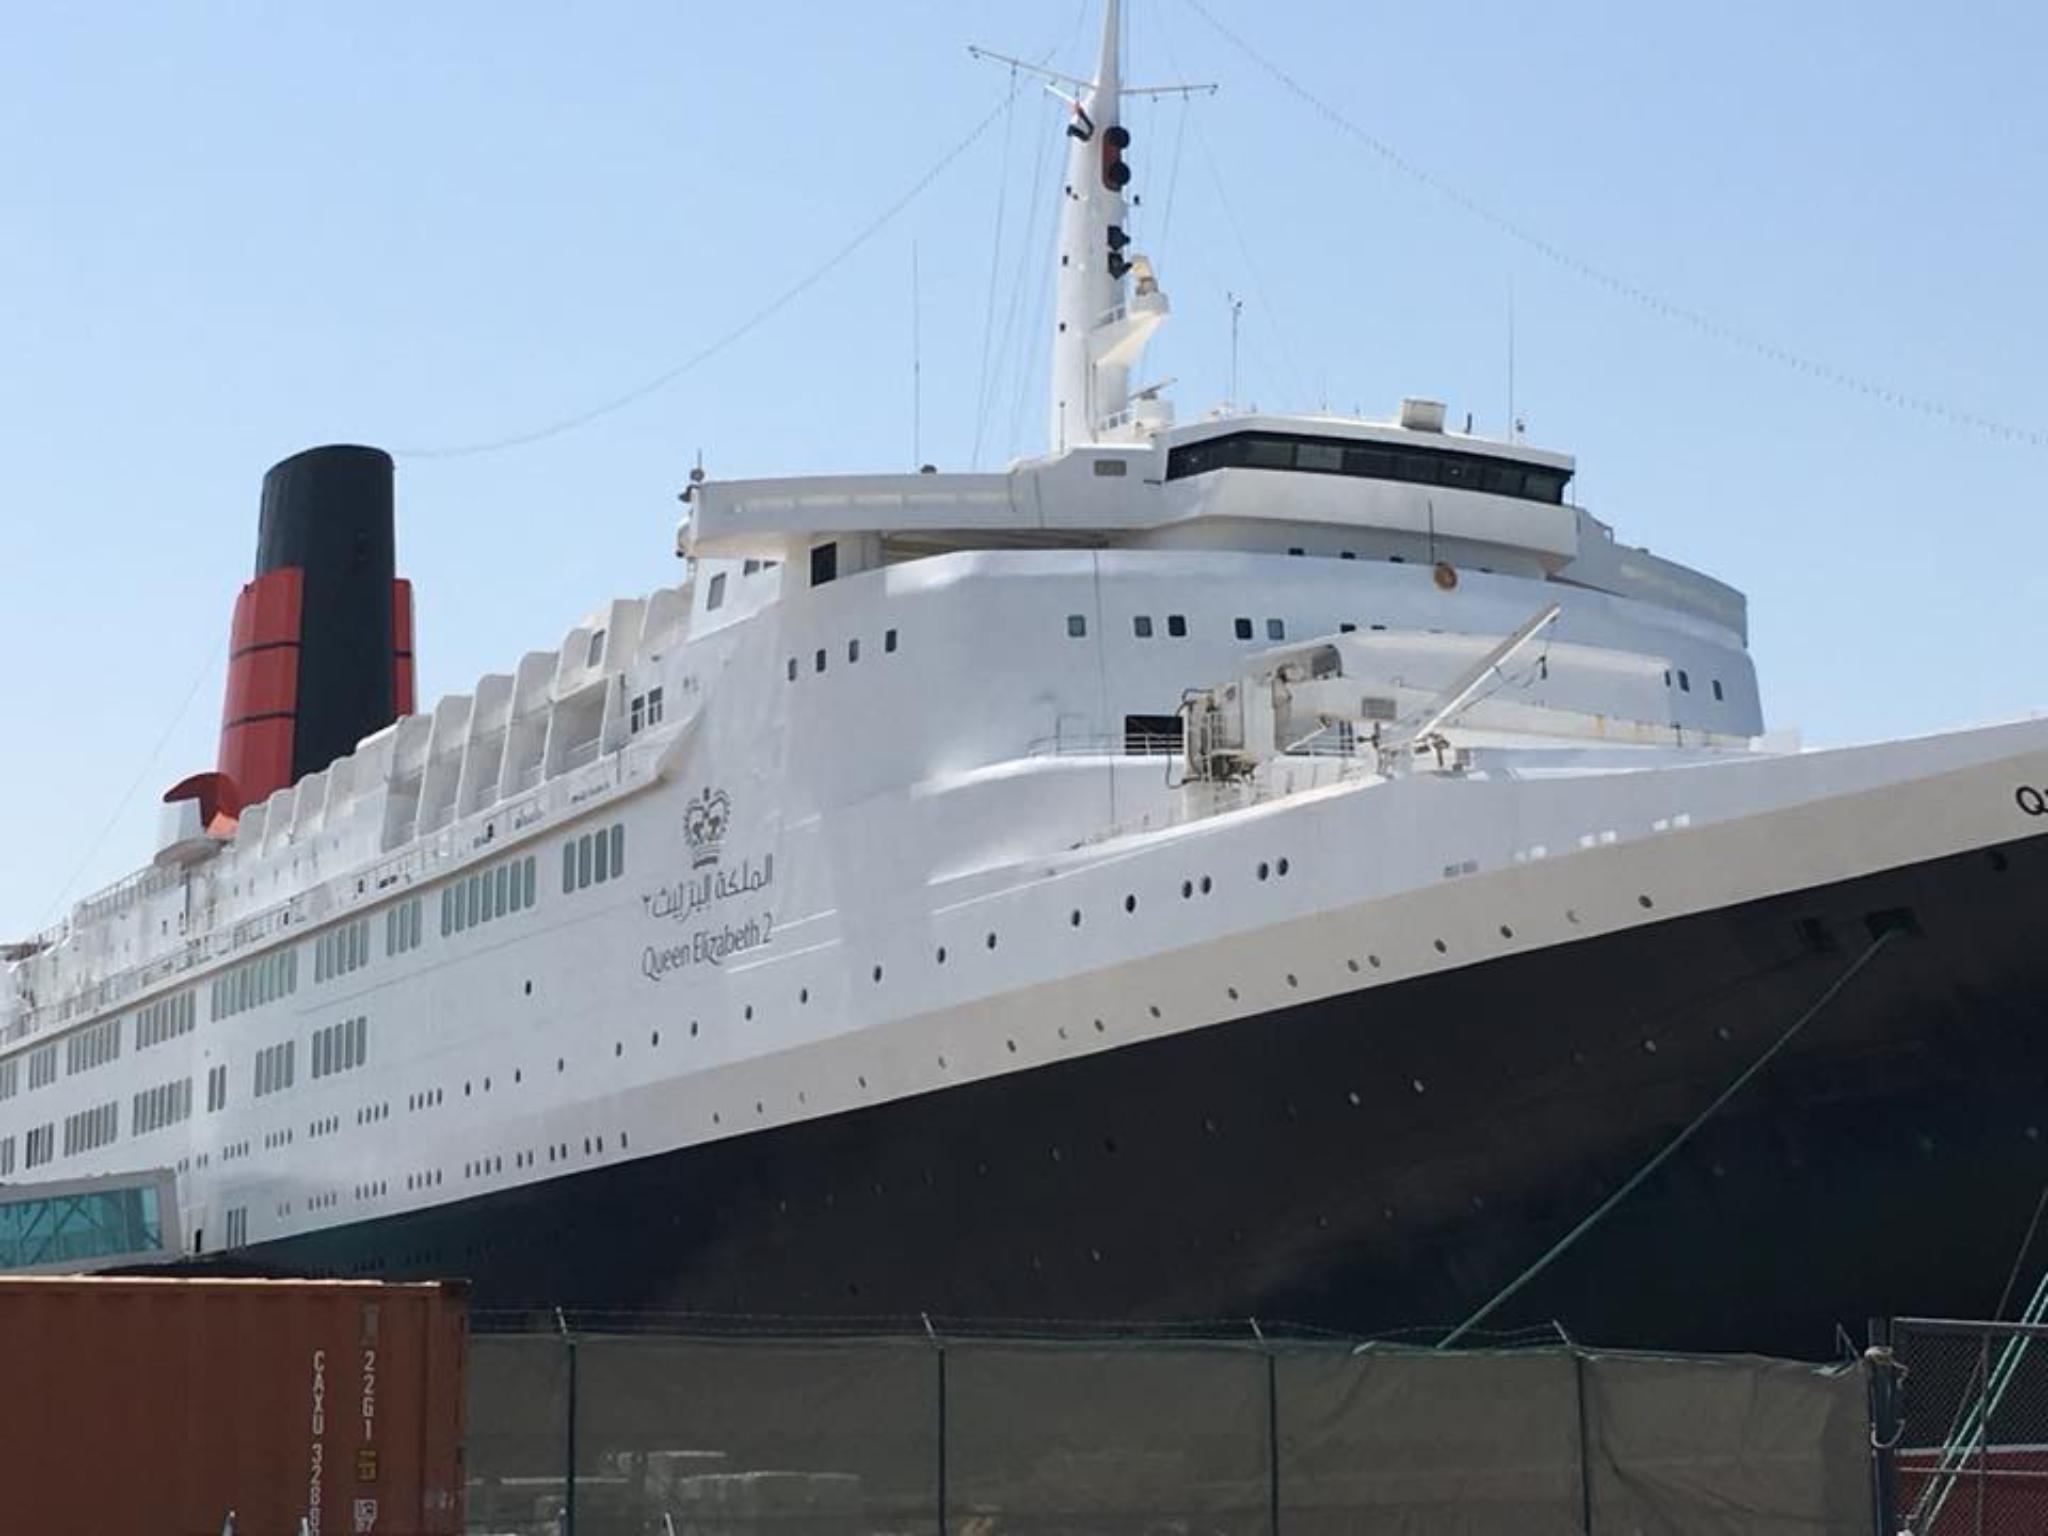 Pin By Oceanic House On Cunard Qe2 Cunard Ships Cunard Cruise